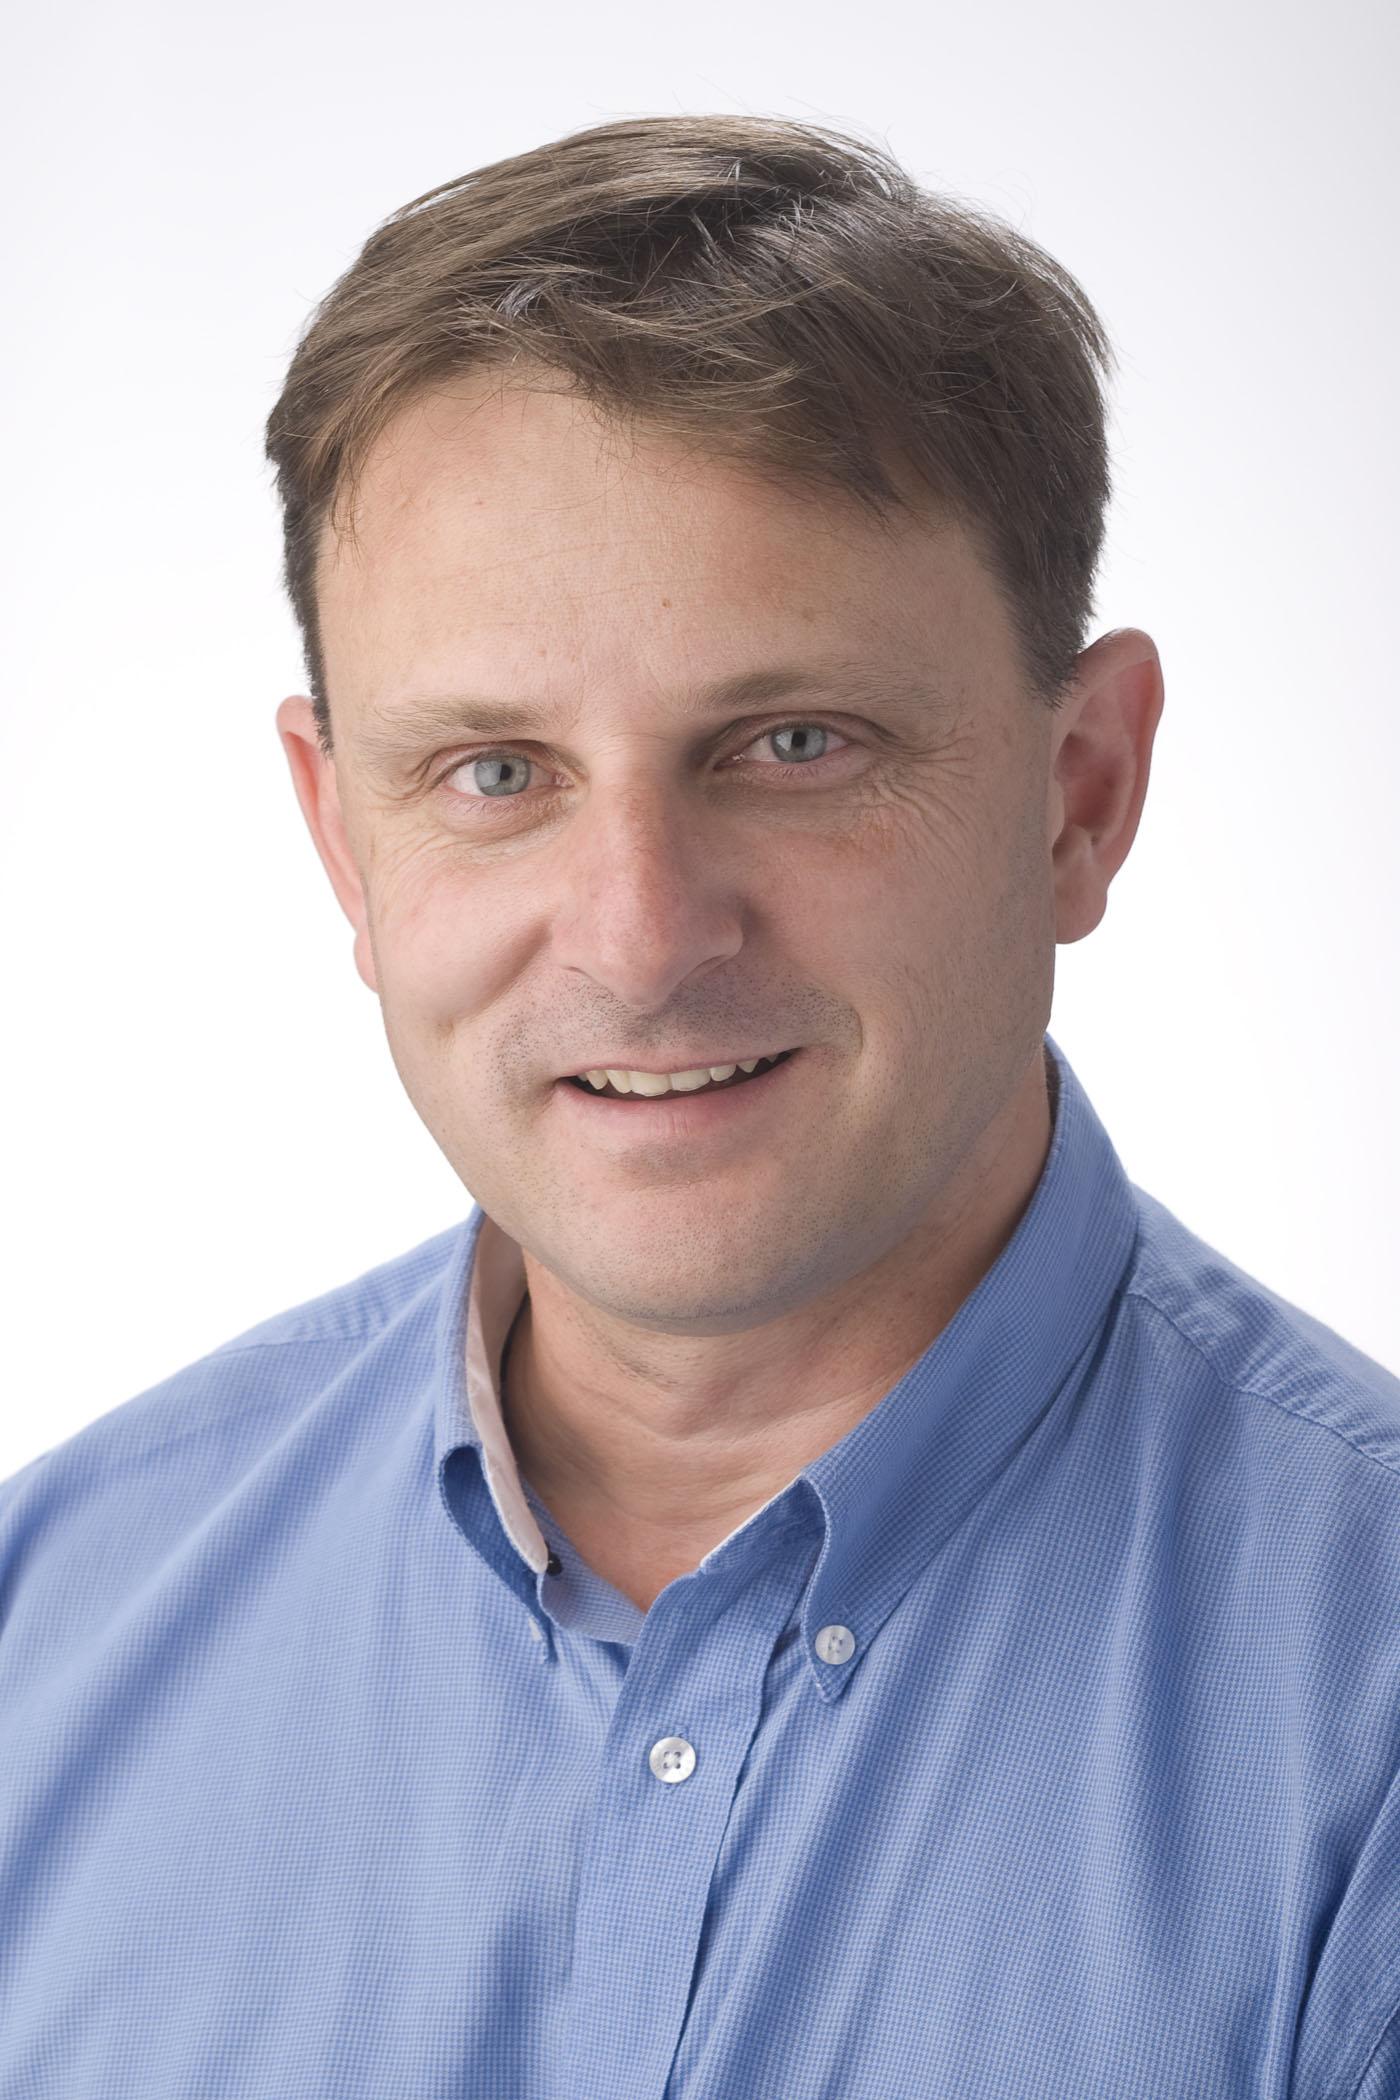 Stephen Orr